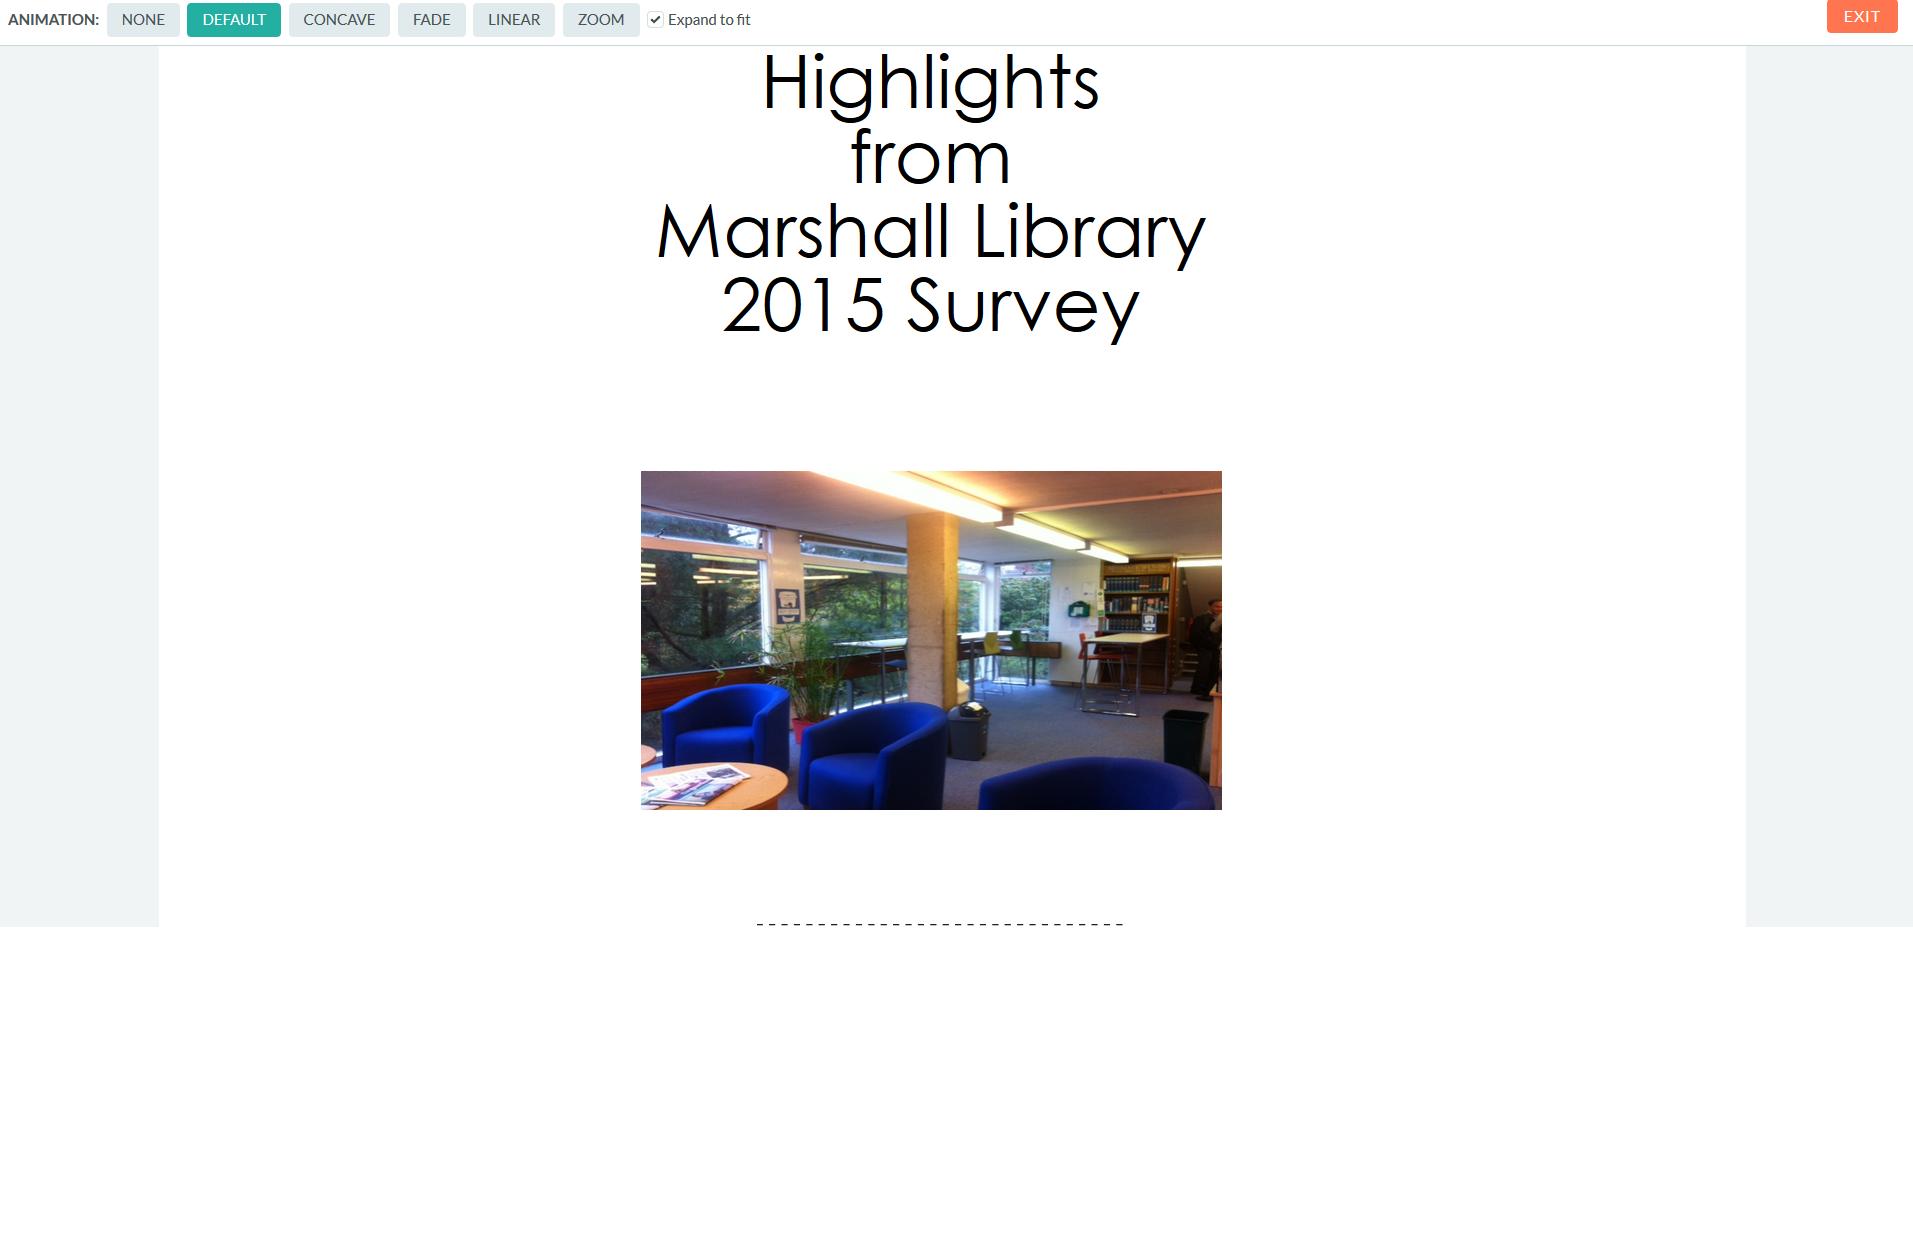 Library Survey 2015: highlights